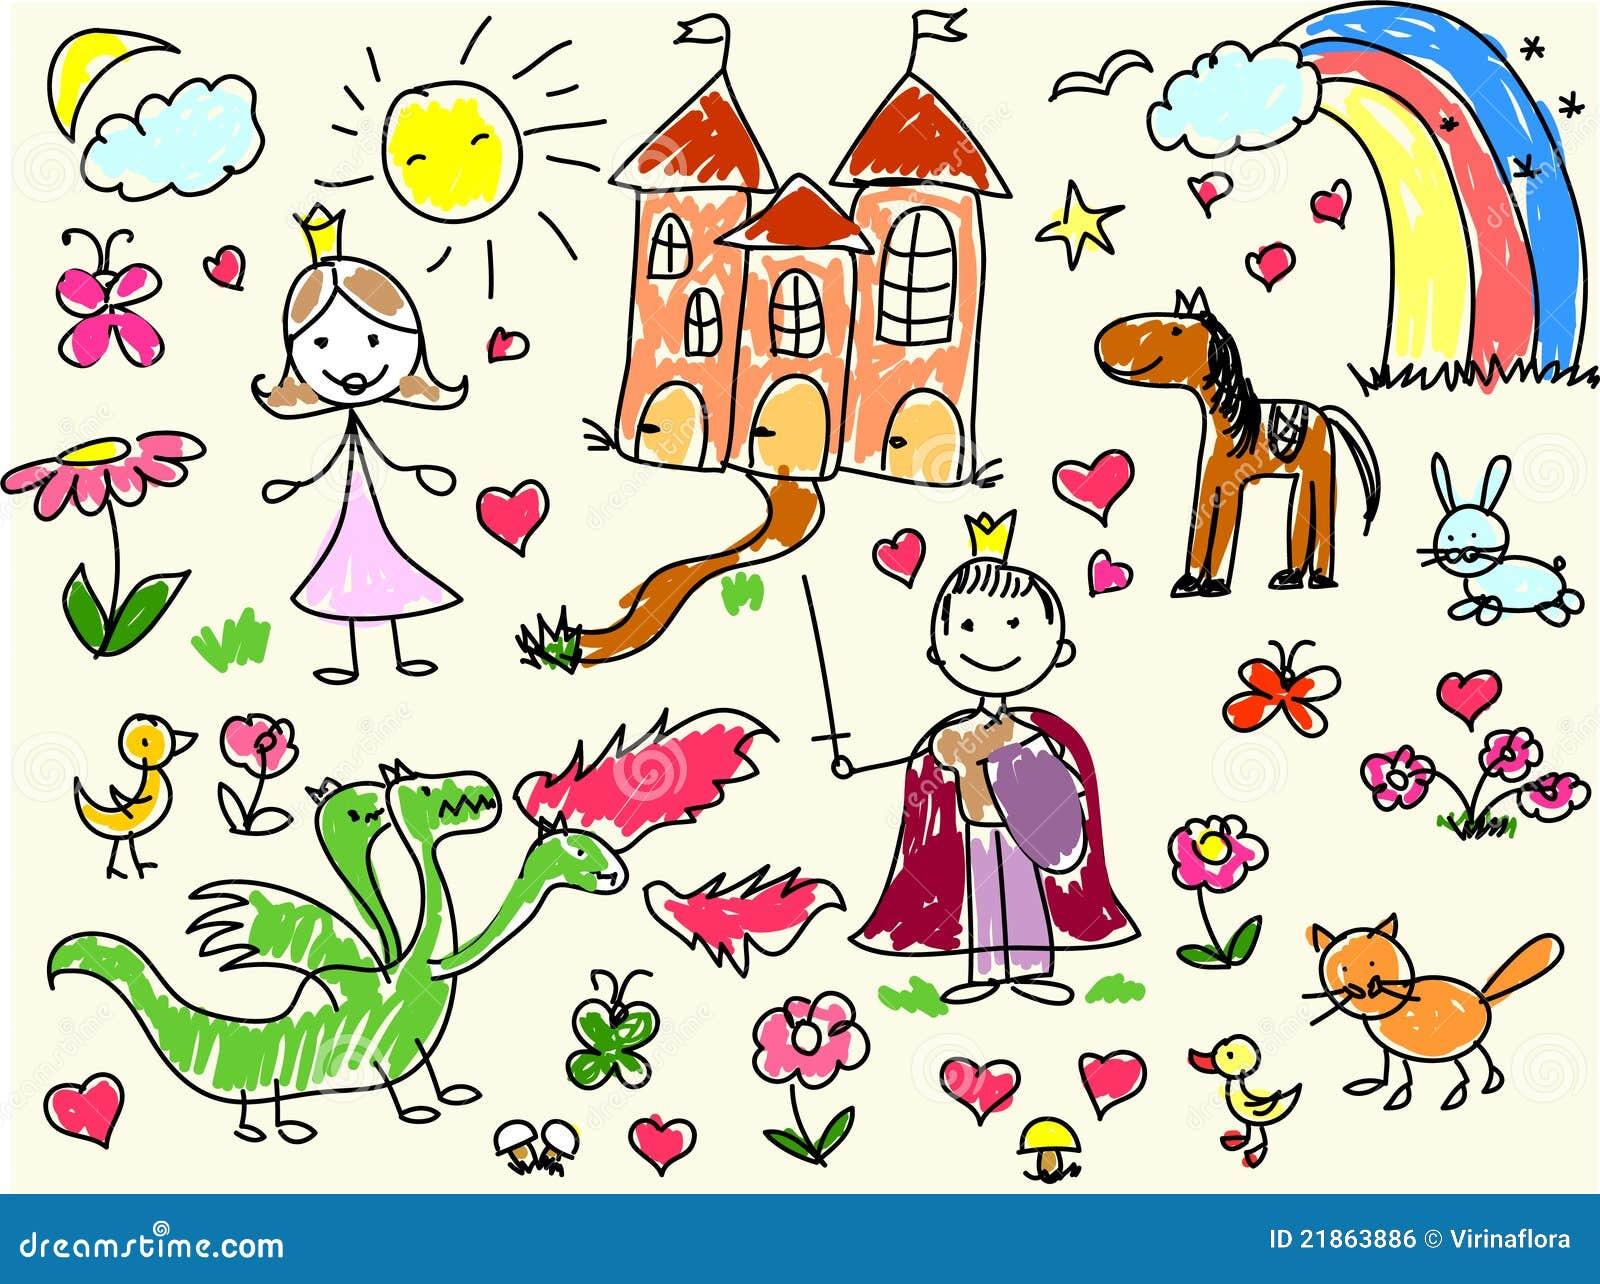 children s drawings vector 21863886jpg 13001060 vrkids recherche pinterest child artist kid drawings and drawings